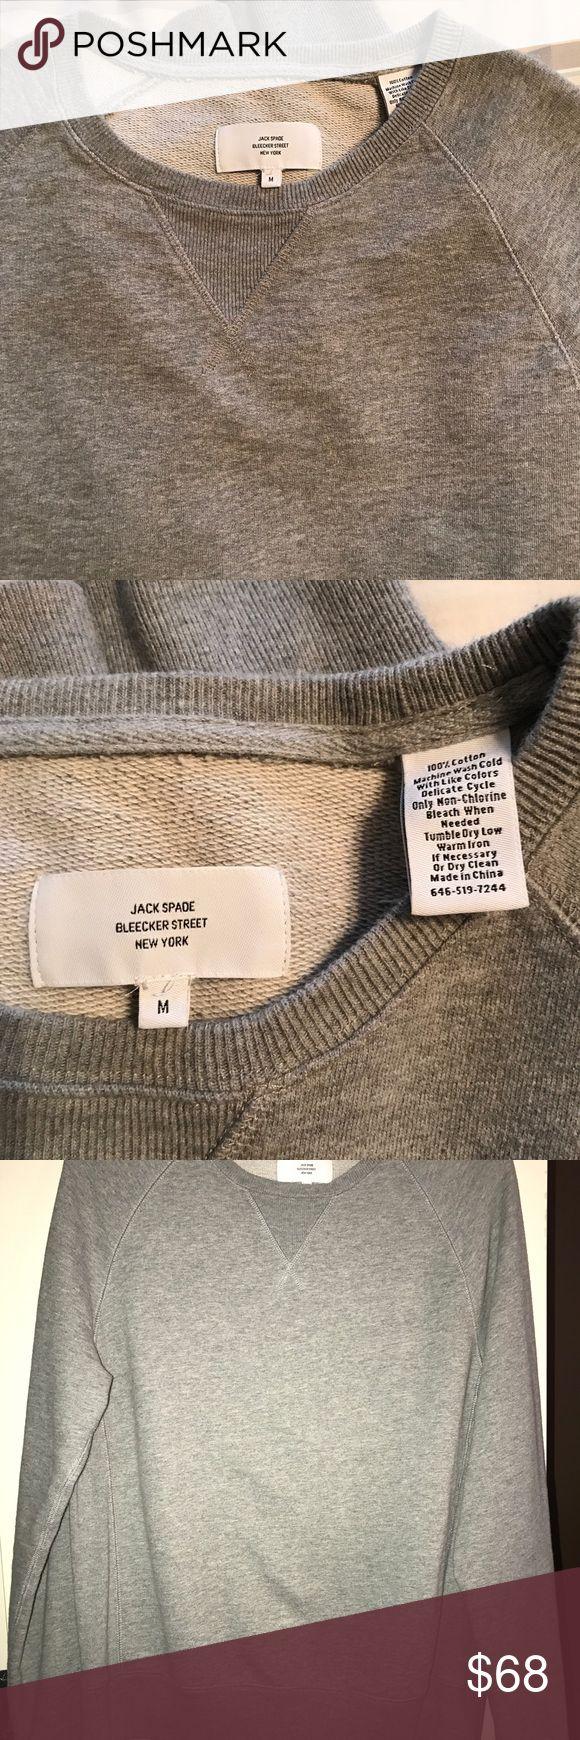 Jack Spade Sweatshirt Medium Jack Spade Sweatshirt. Medium. Worn once, and not to the gym 😉 Jack Spade Sweaters